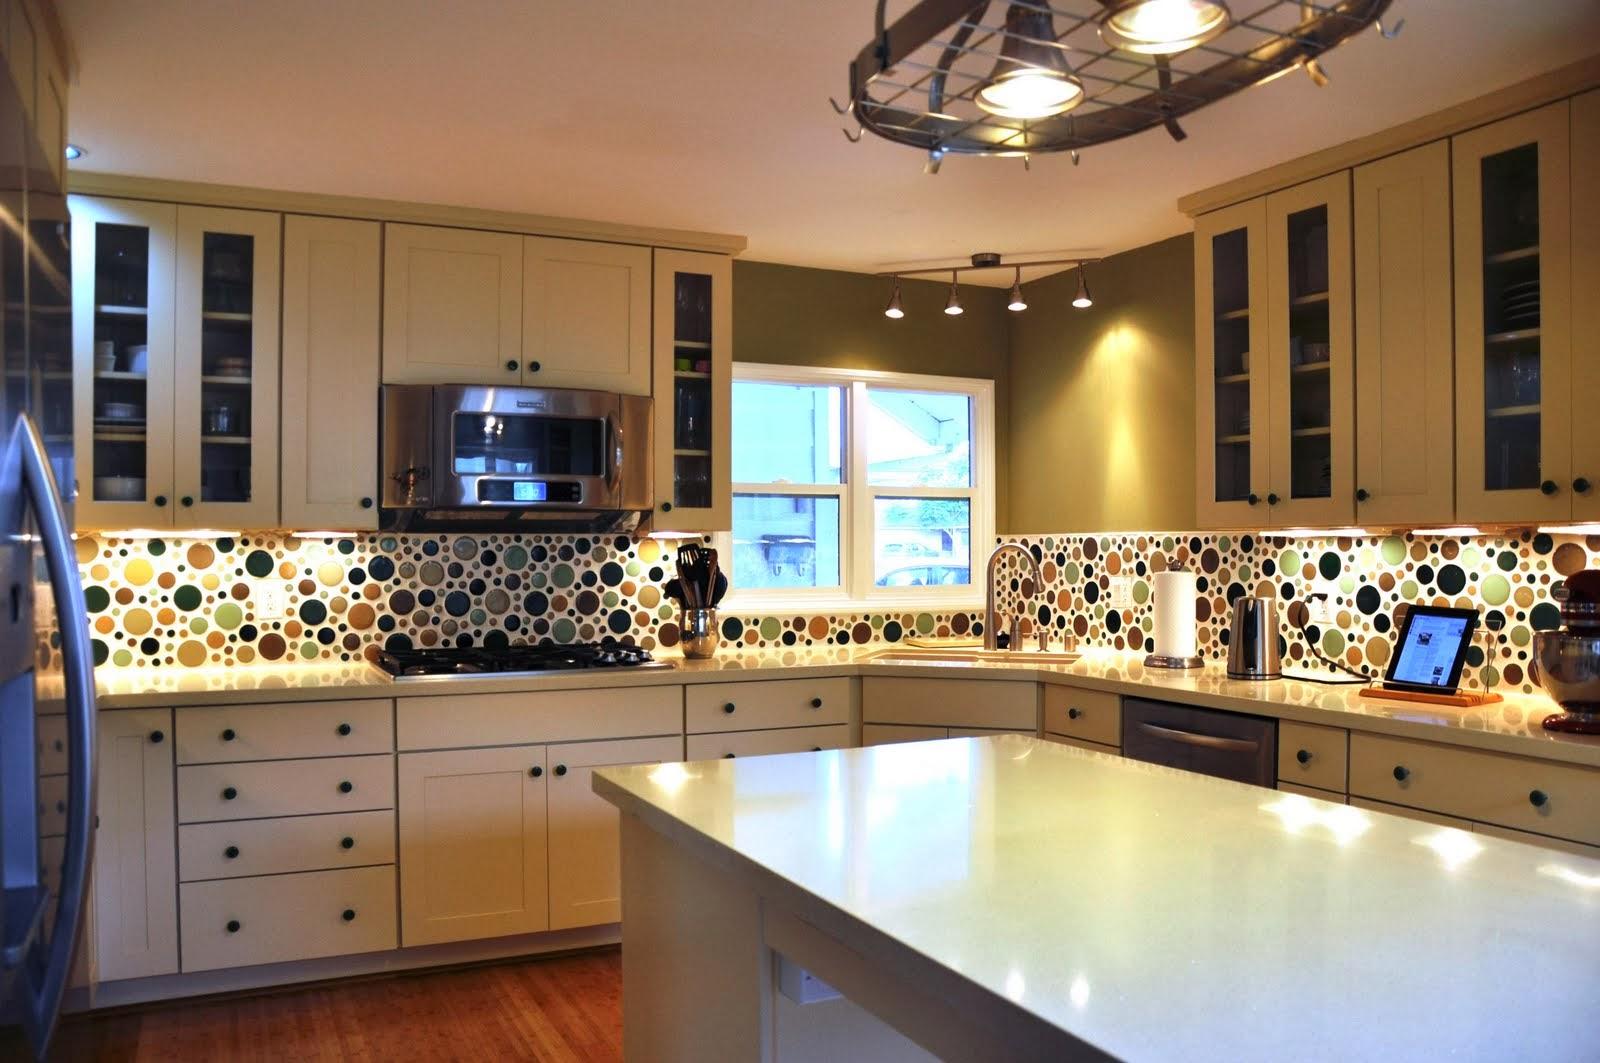 Wall Paint For Kitchen Foundation Dezin Decor Colors For Kitchen